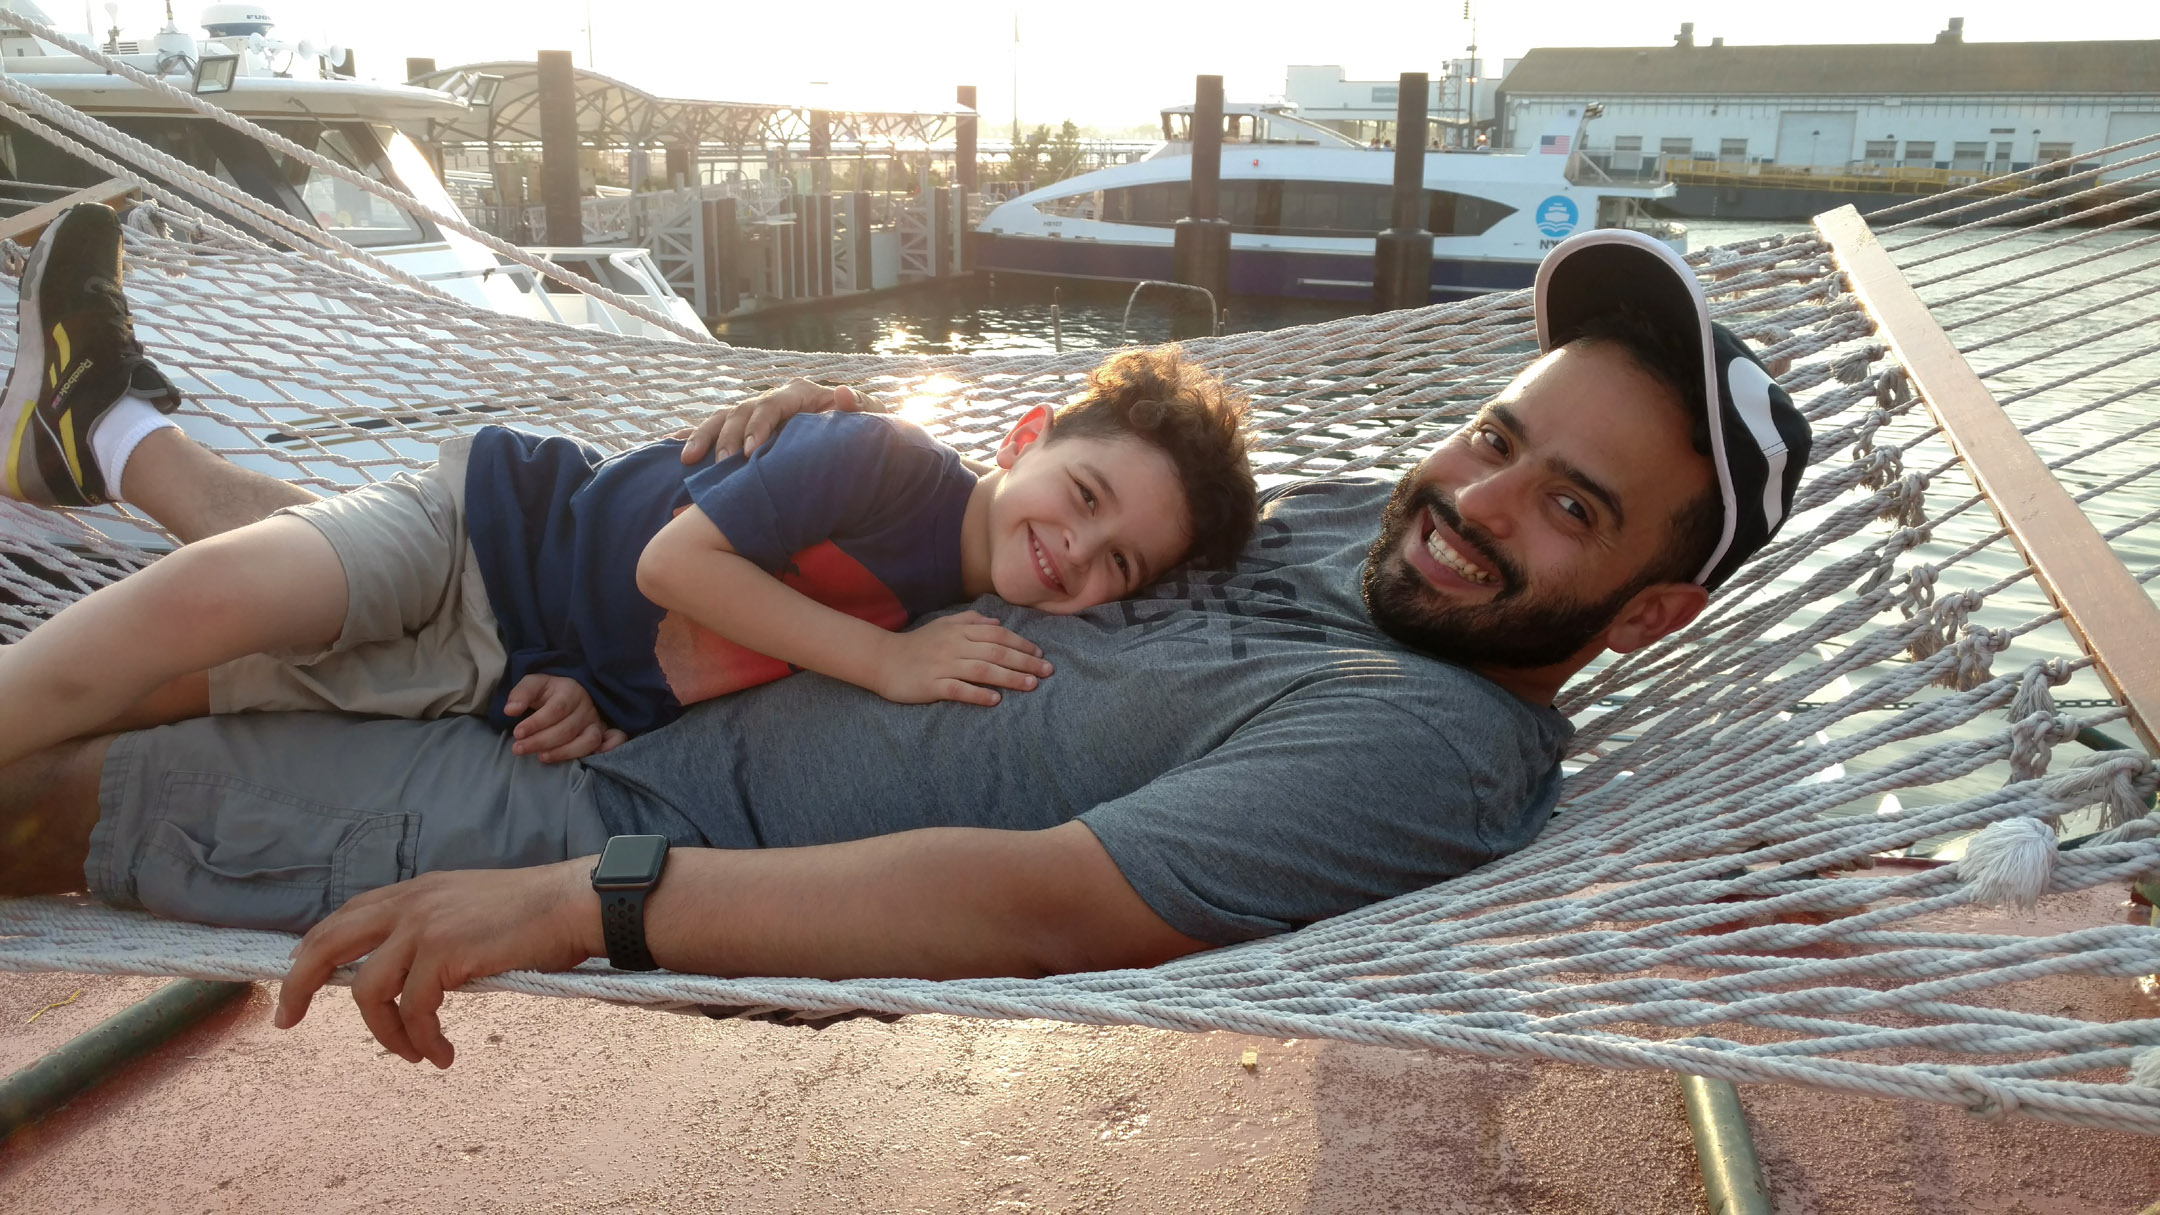 180601_Julian Morales +Jonah (1) rtch lo res.jpg